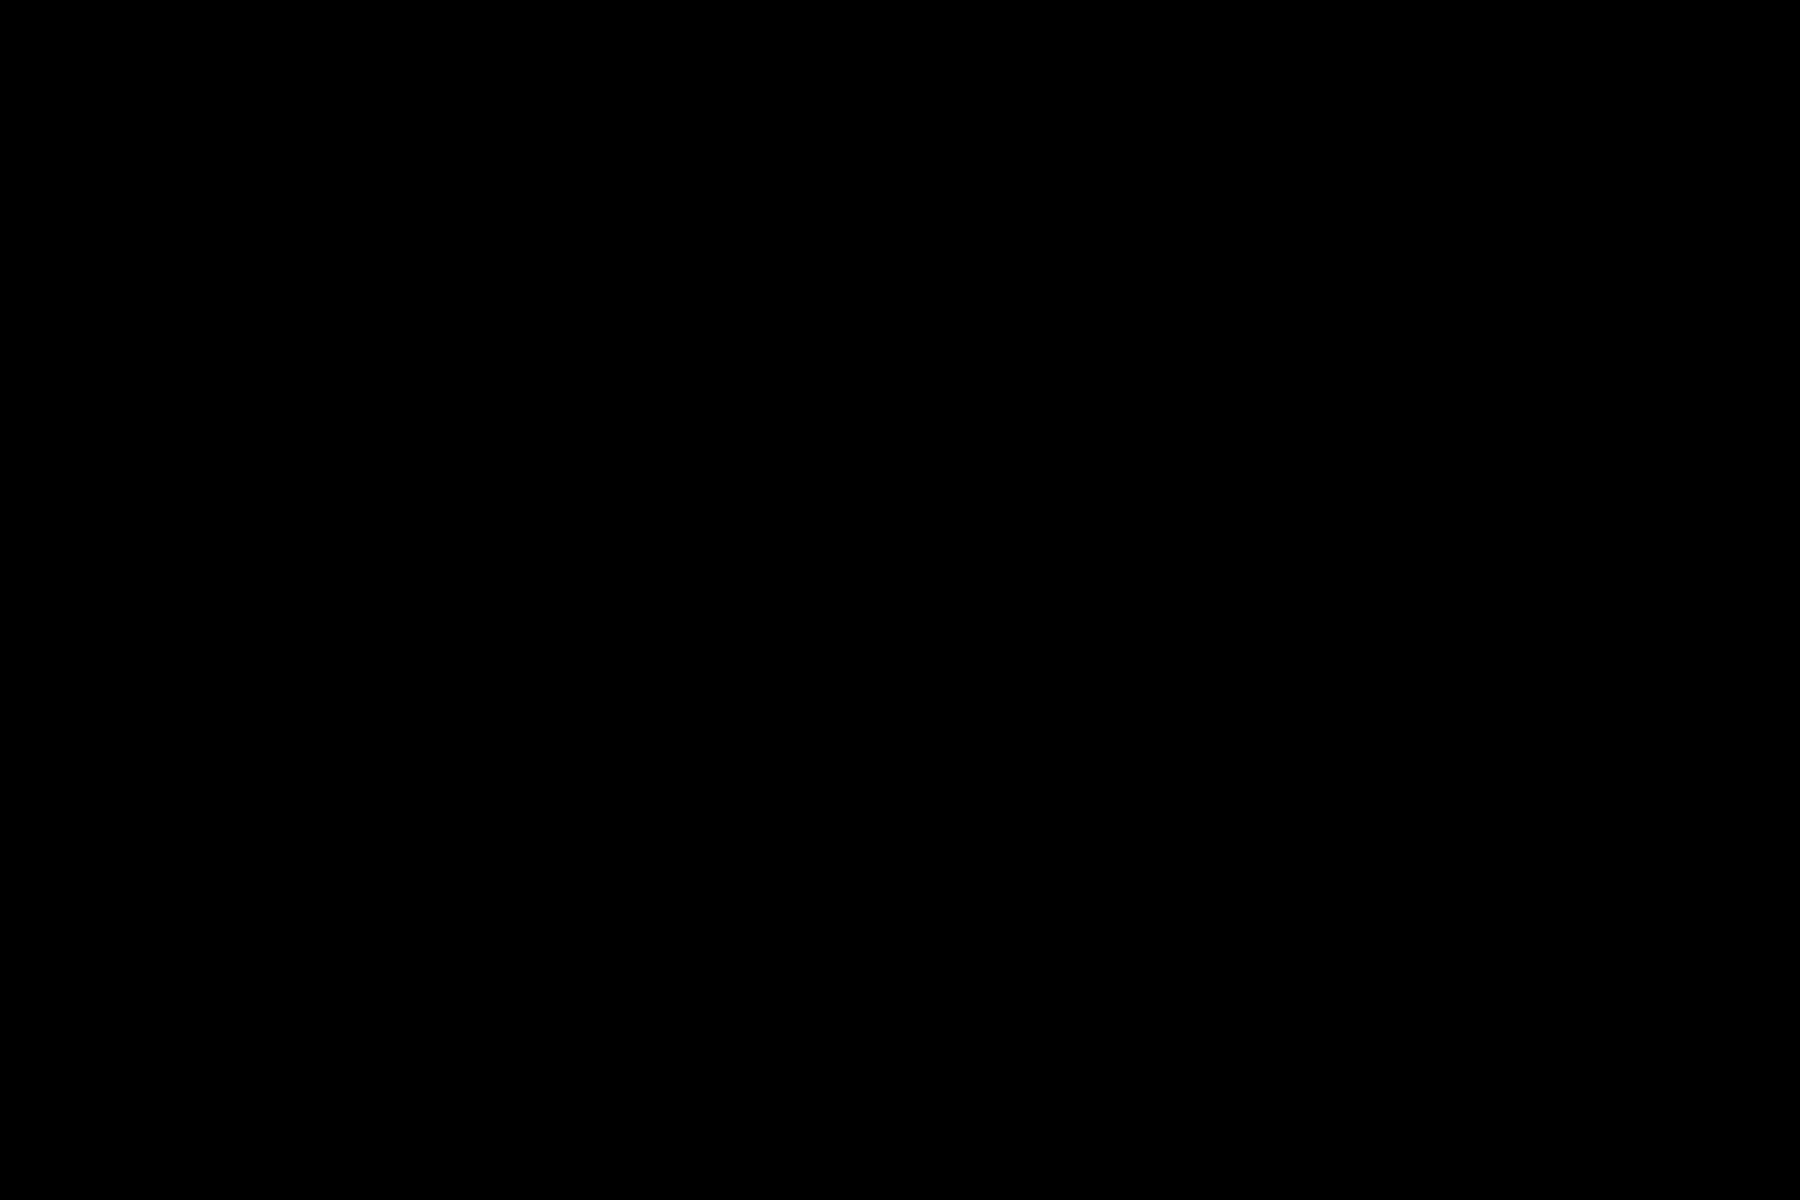 Identifikation durch Illustration